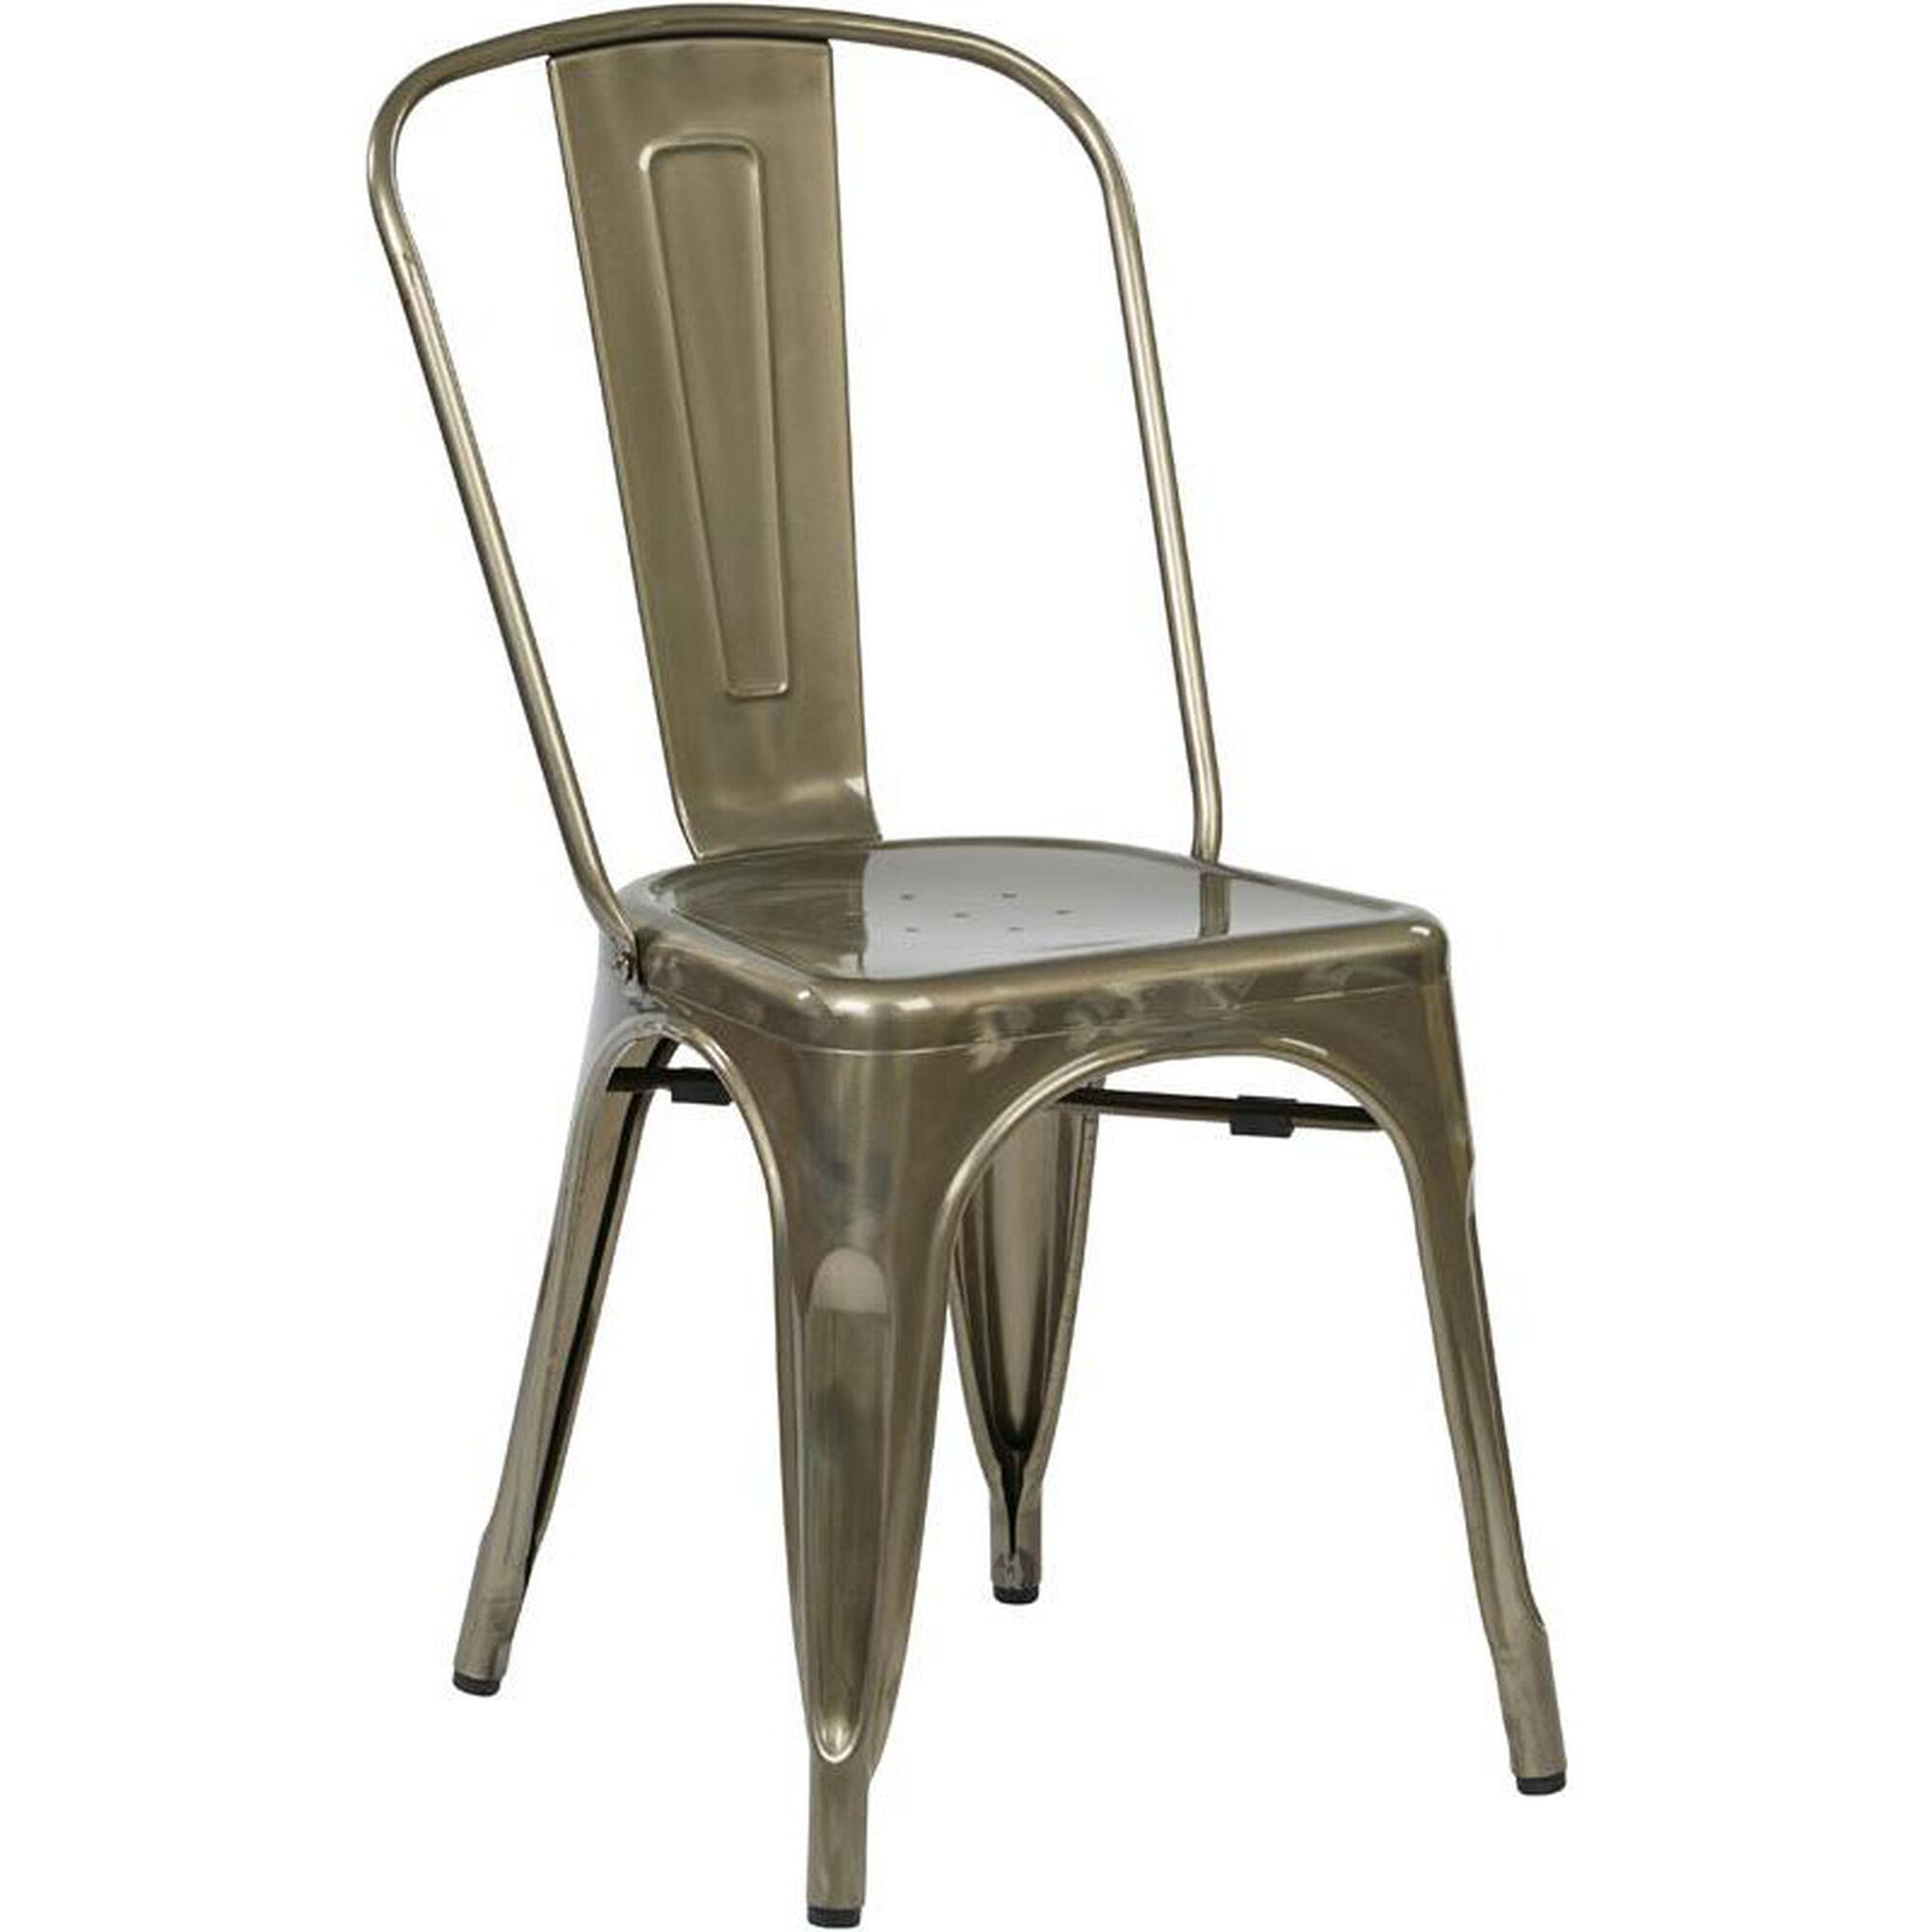 Set Of 2 Gunmetal Stacking Chair Brw29a2 Gm Bizchair Com